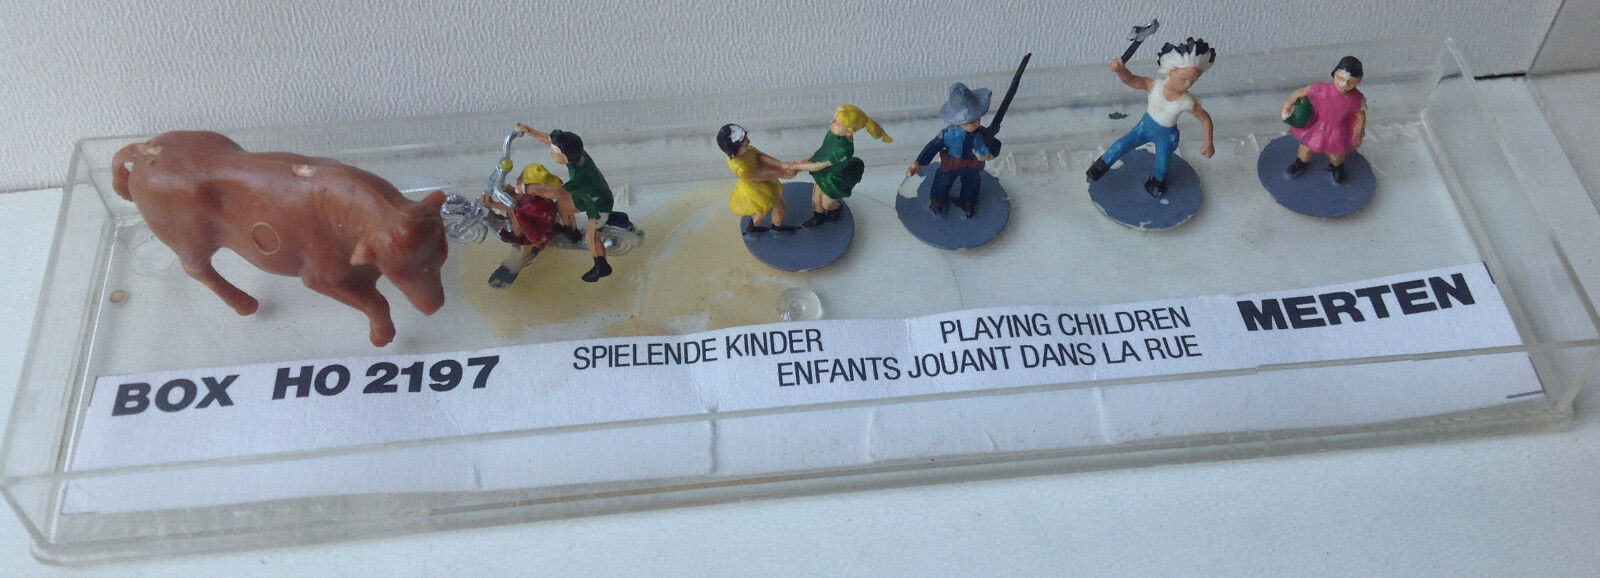 MERTEN HO Scale 2197  Miniature Plastics - Figures - Cowboy, Indian, Cow, Kids